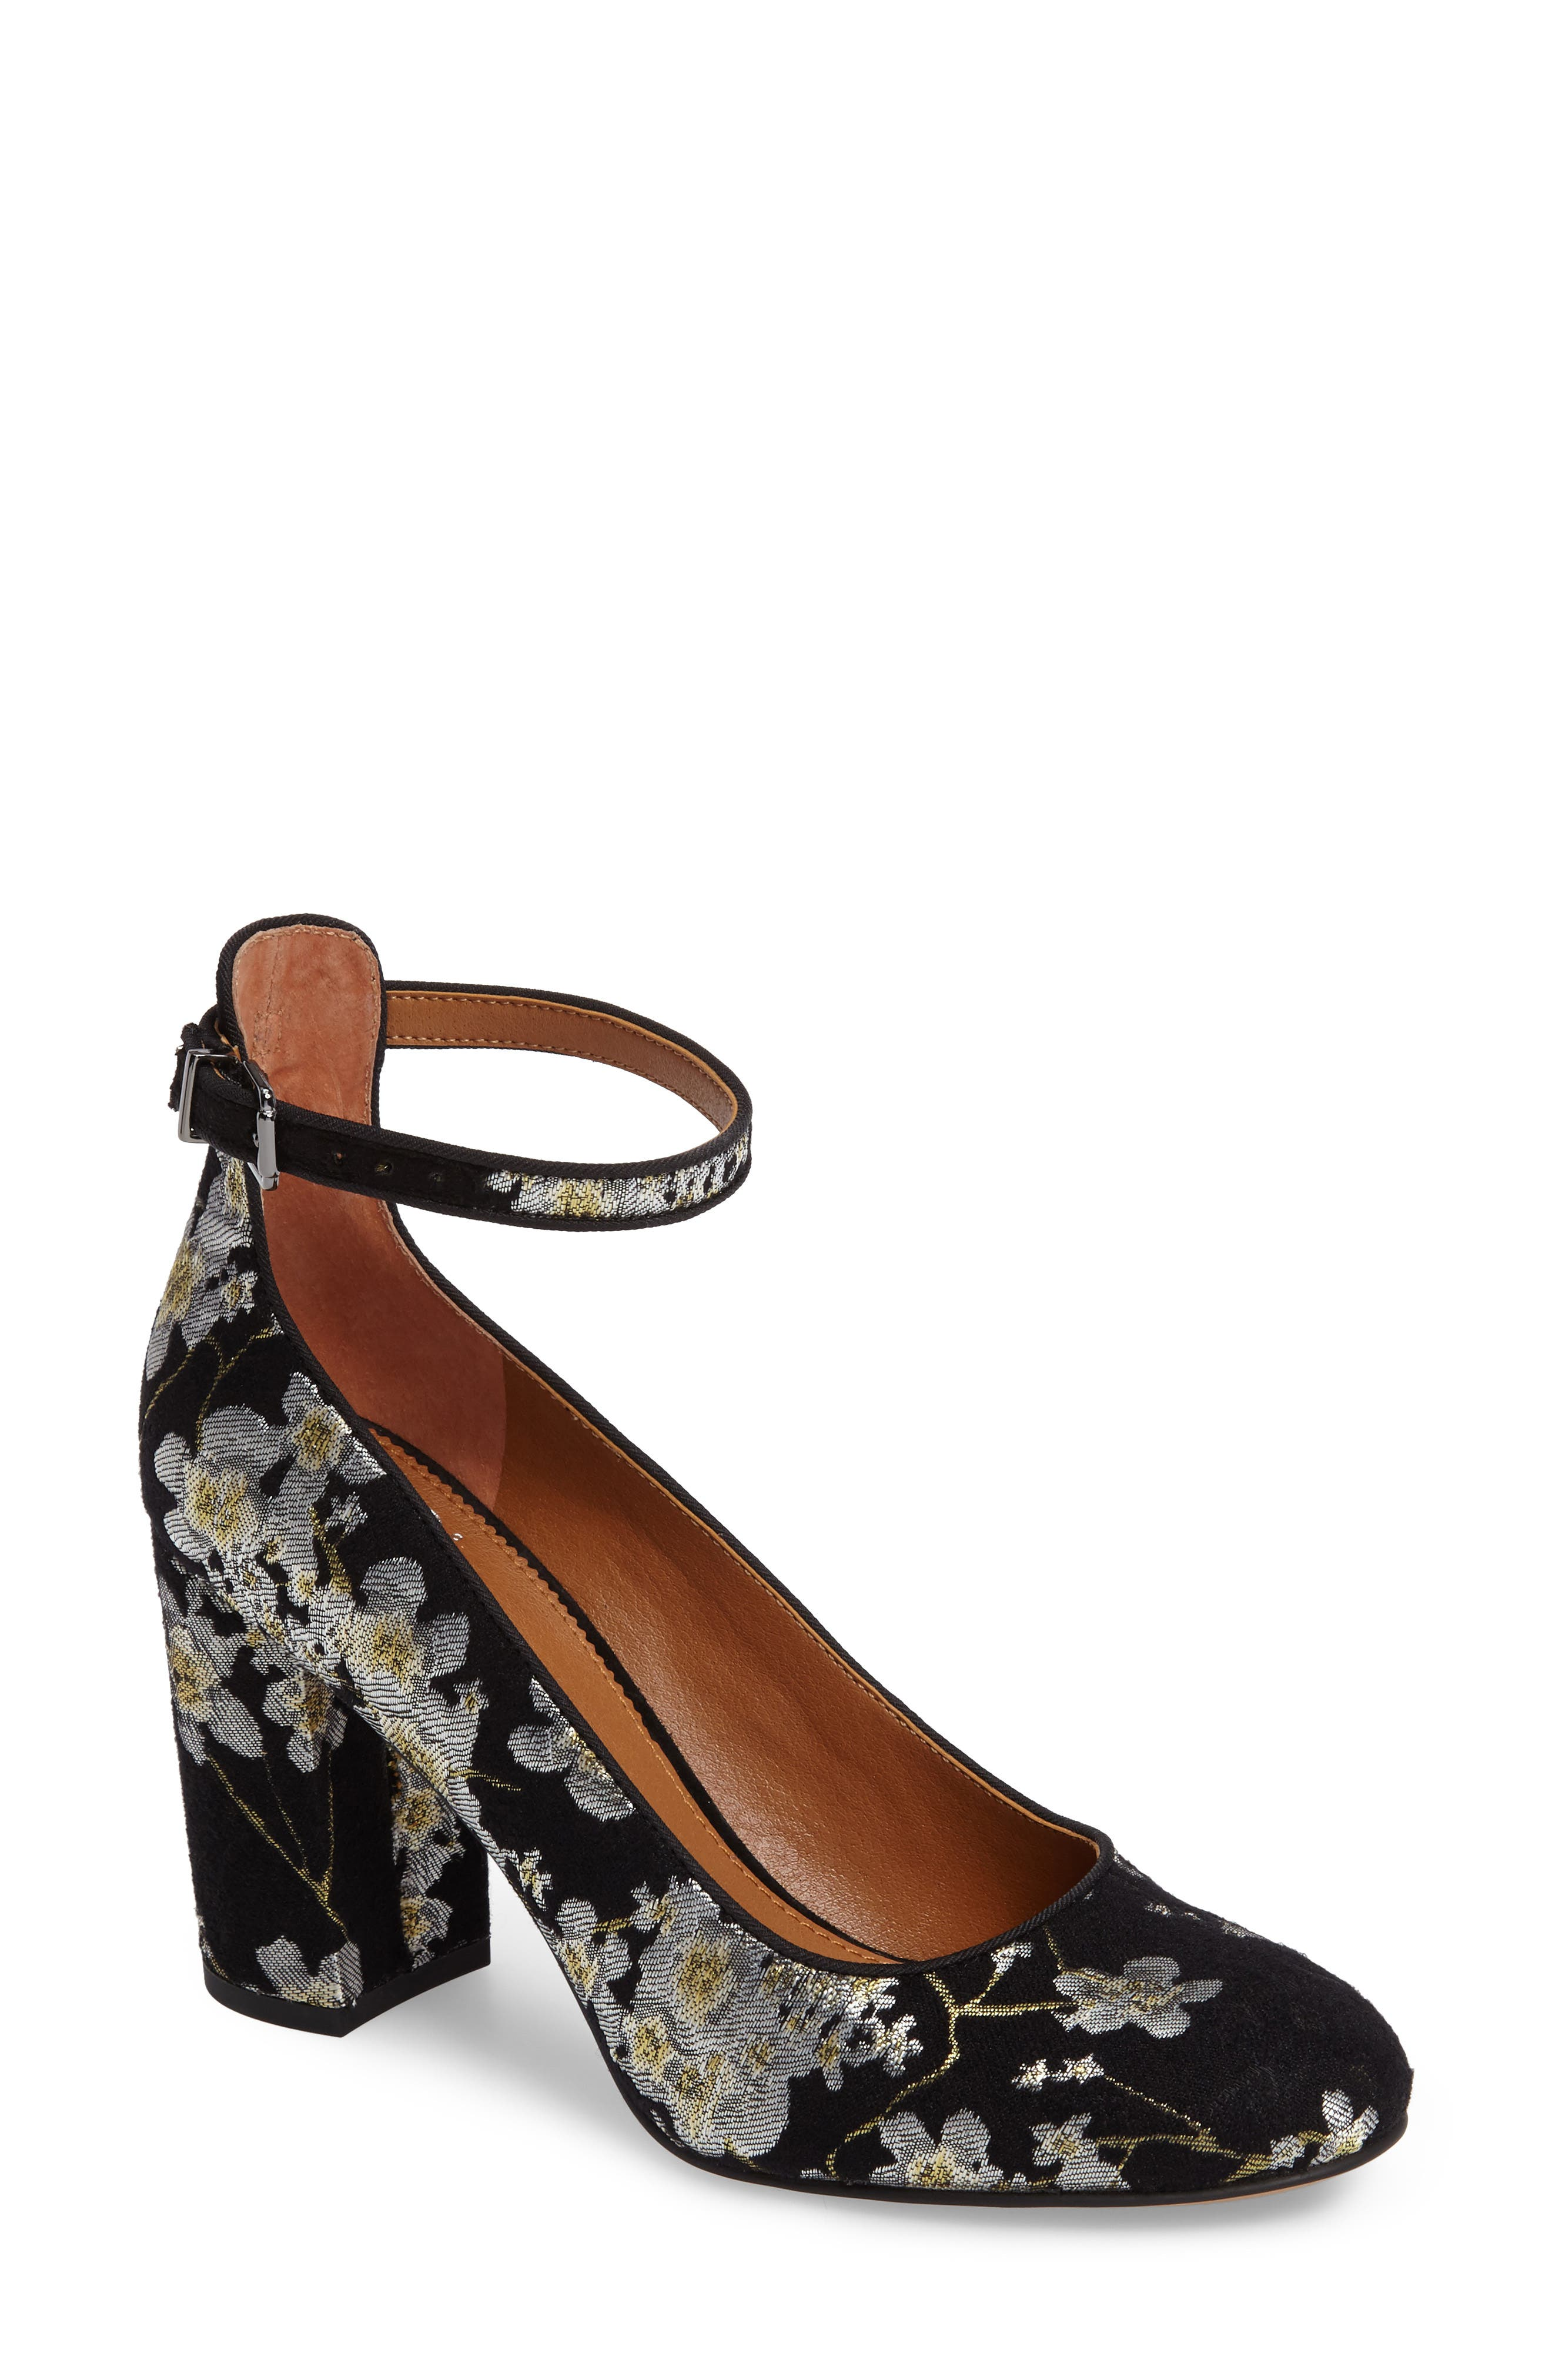 Main Image - SARTO by Franco Sarto Abbington Ankle Strap Pump (Women)